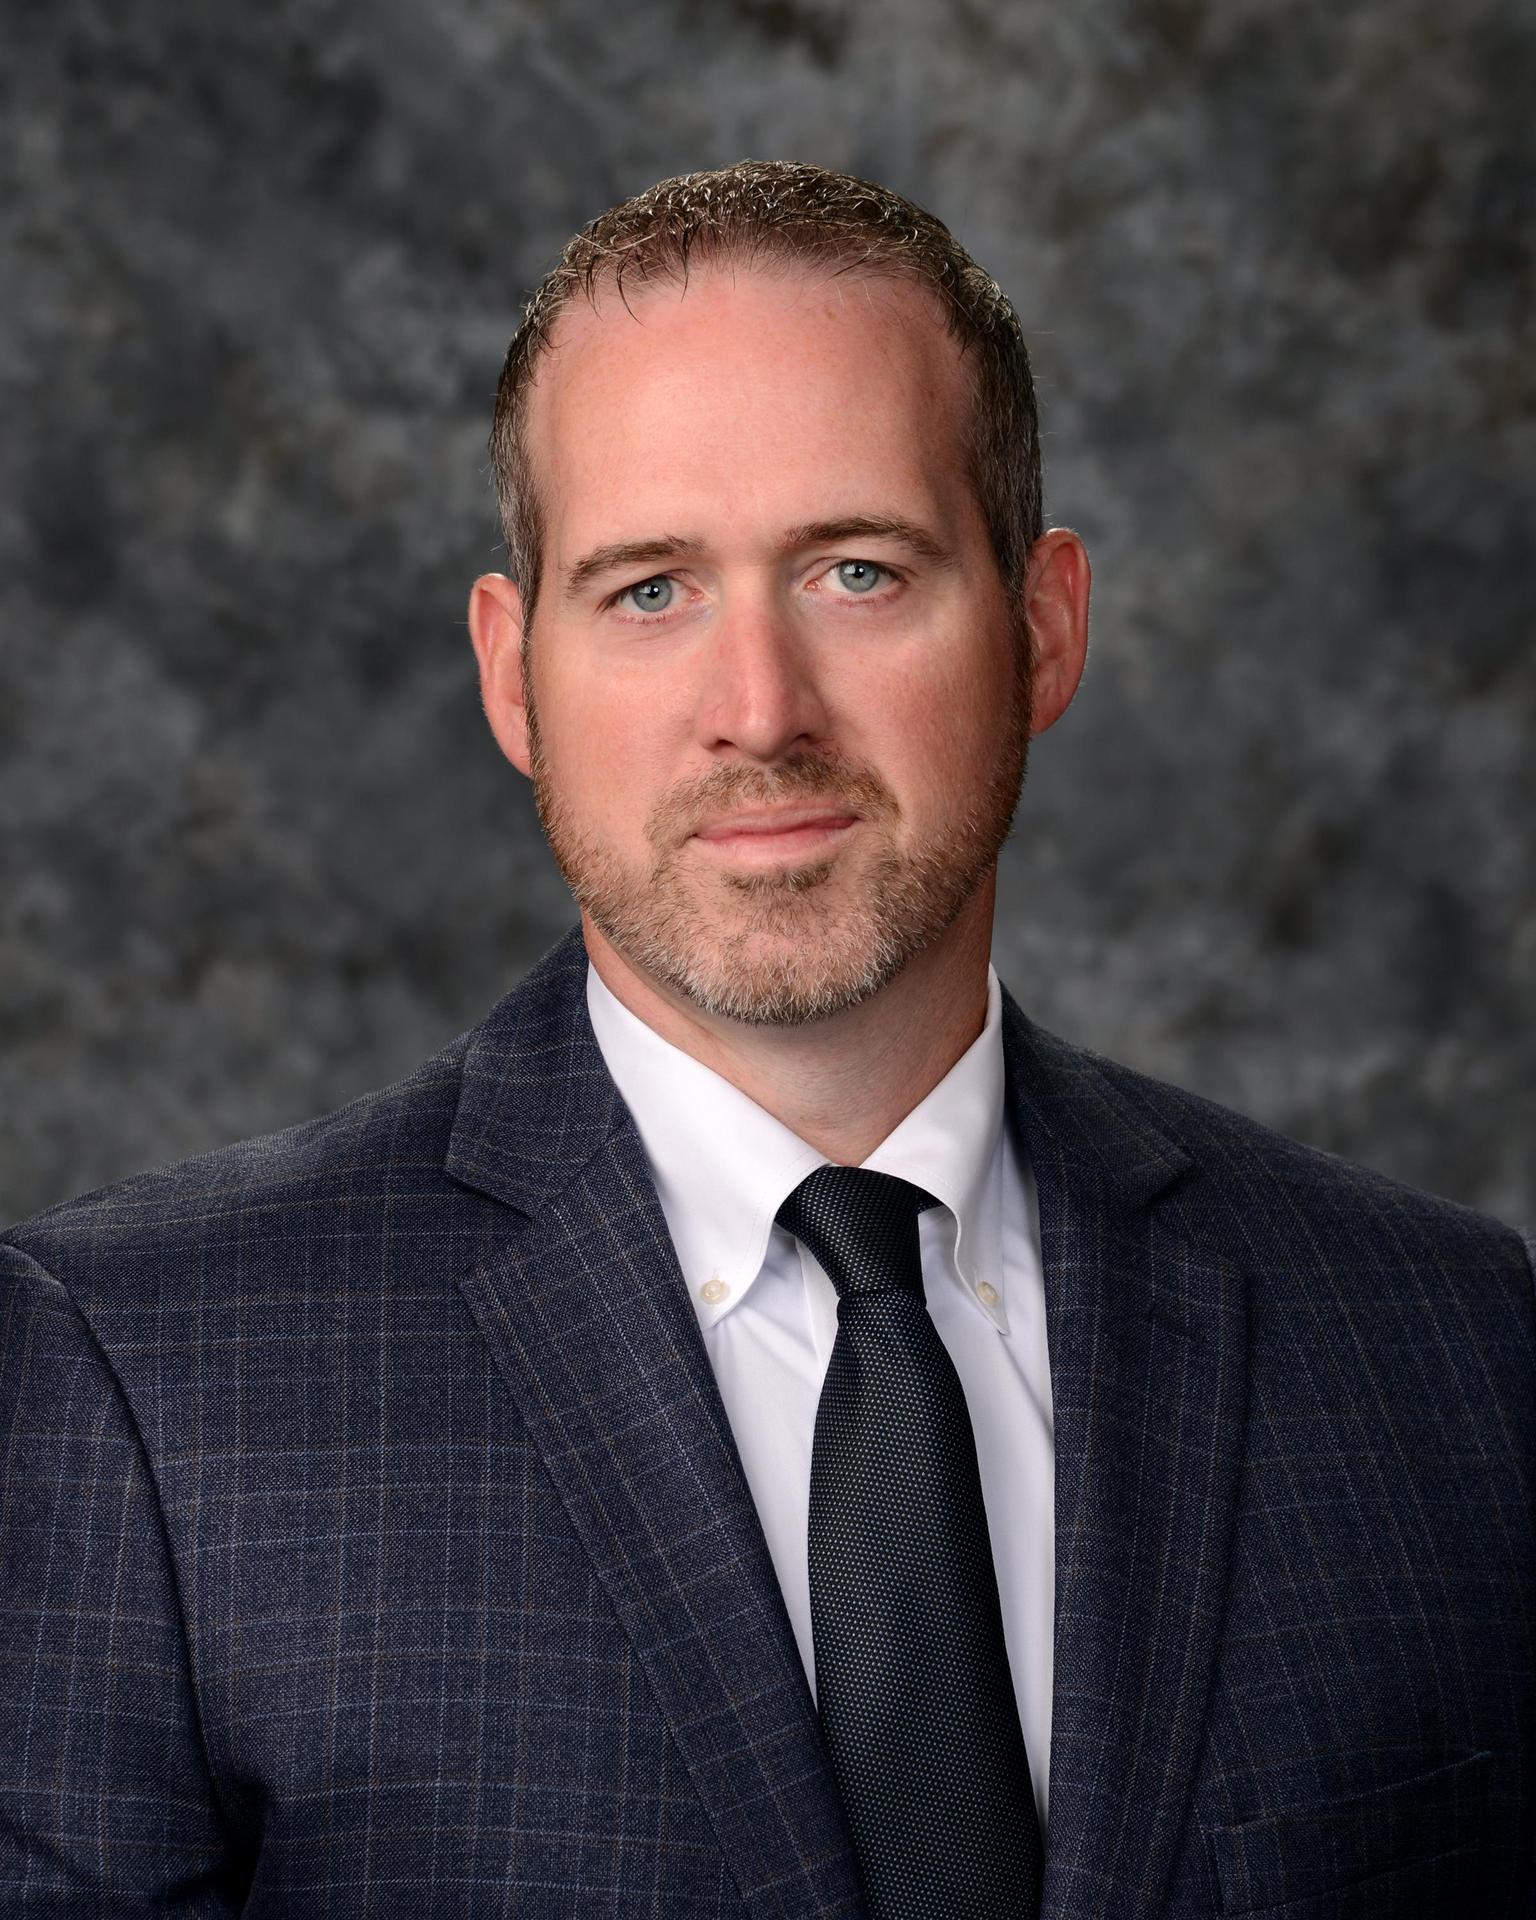 Ryan Gilding, Public Relations Specialist